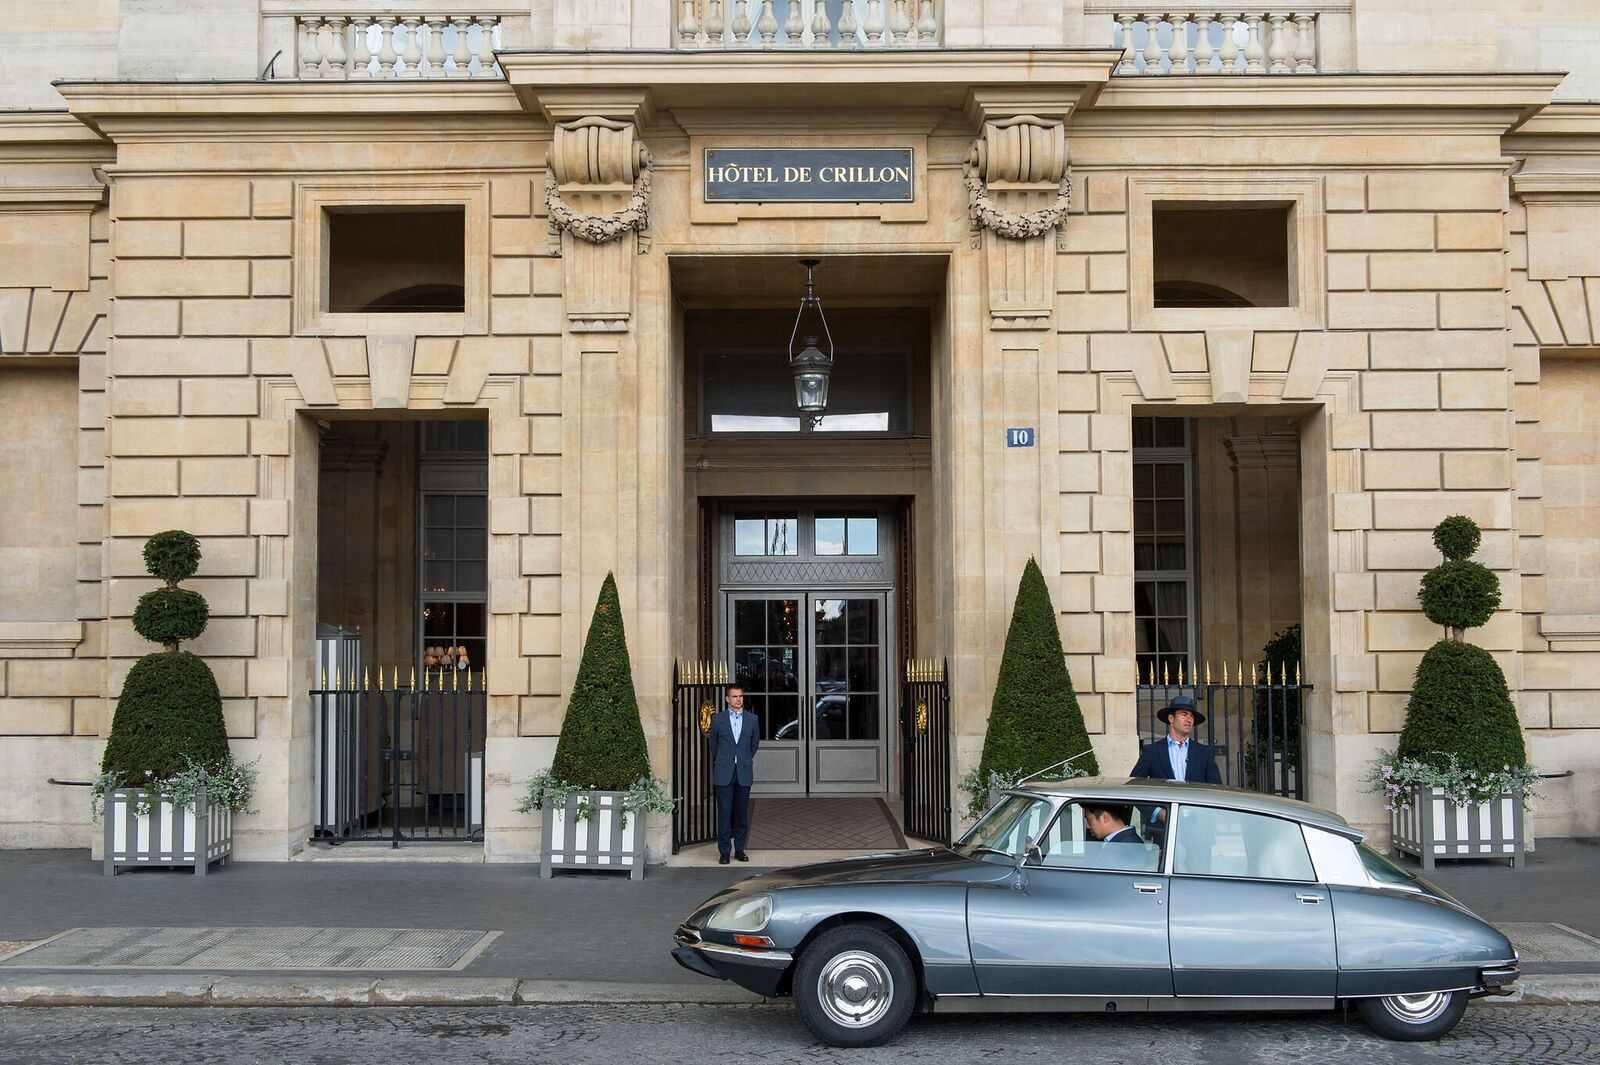 Le Crillon Rosewood Paris (12 Days of Rosewood)